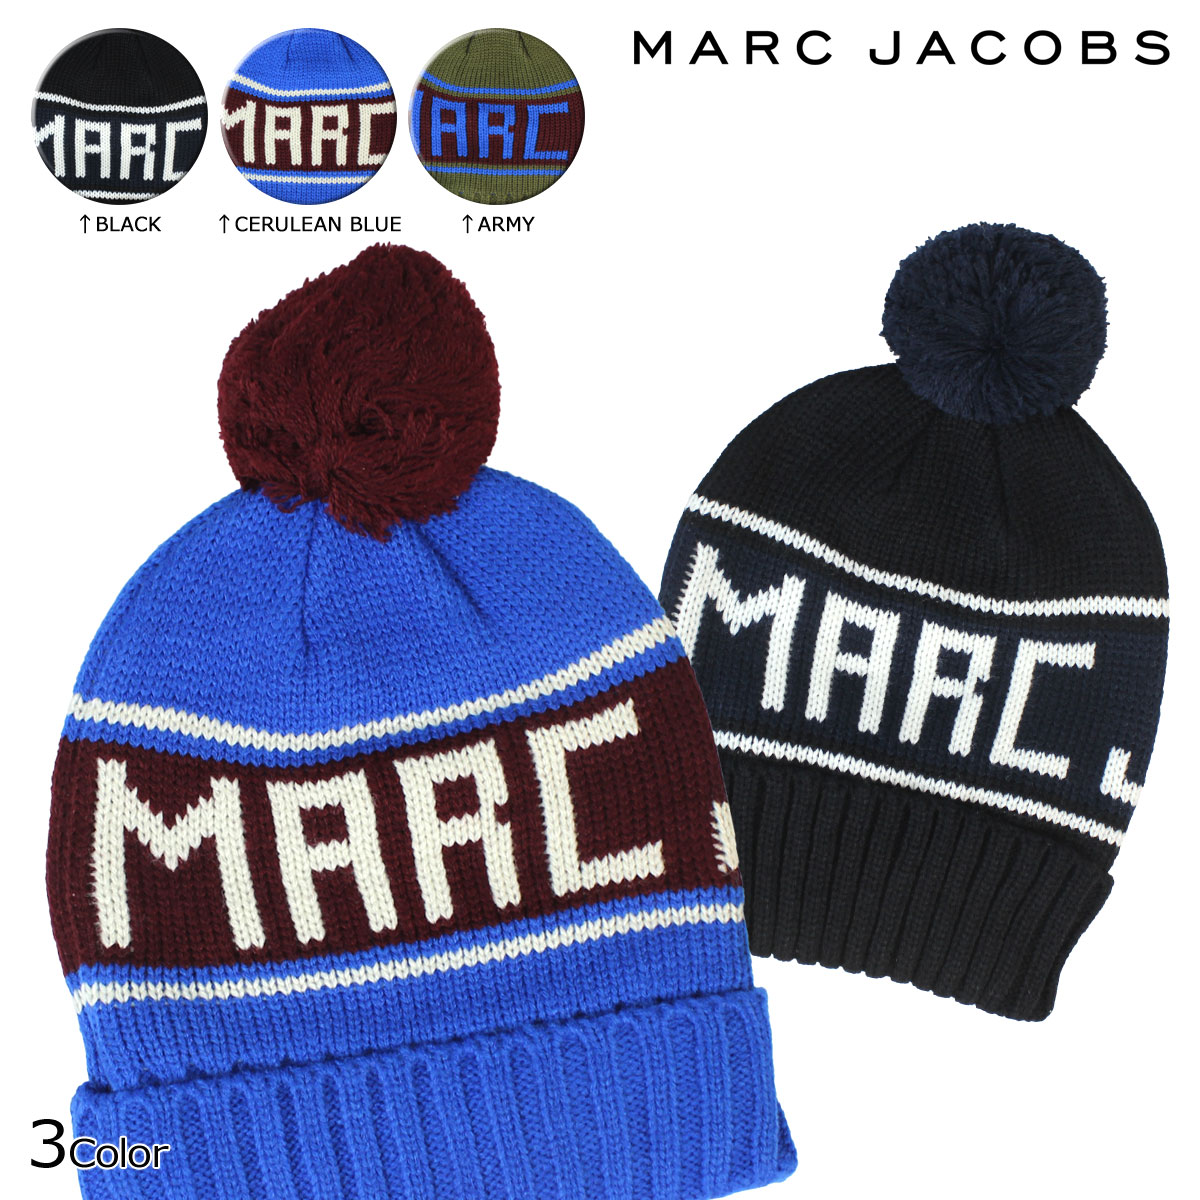 6d07152898d ALLSPORTS  MARC BY MARC JACOBS mark by mark Jacobs knit hat beanie knit cap  3 color F14 ACRYLIC SKI HAT men gap Dis